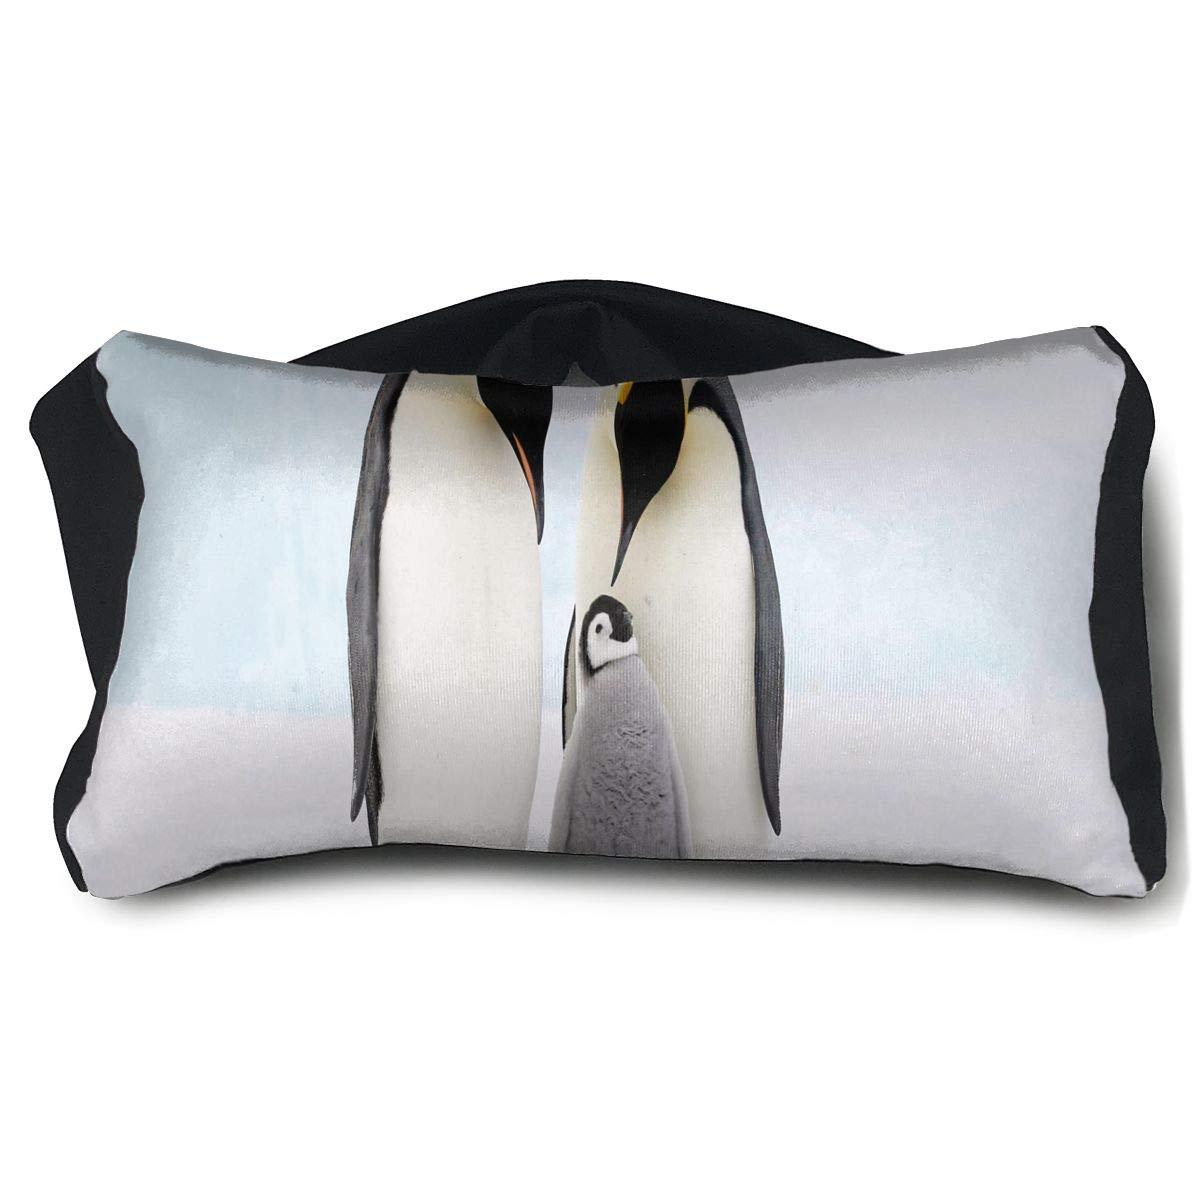 Eye Pillow Penguin Family Unique Womens Portable Blindfold Sleeping Eye Bag Bed